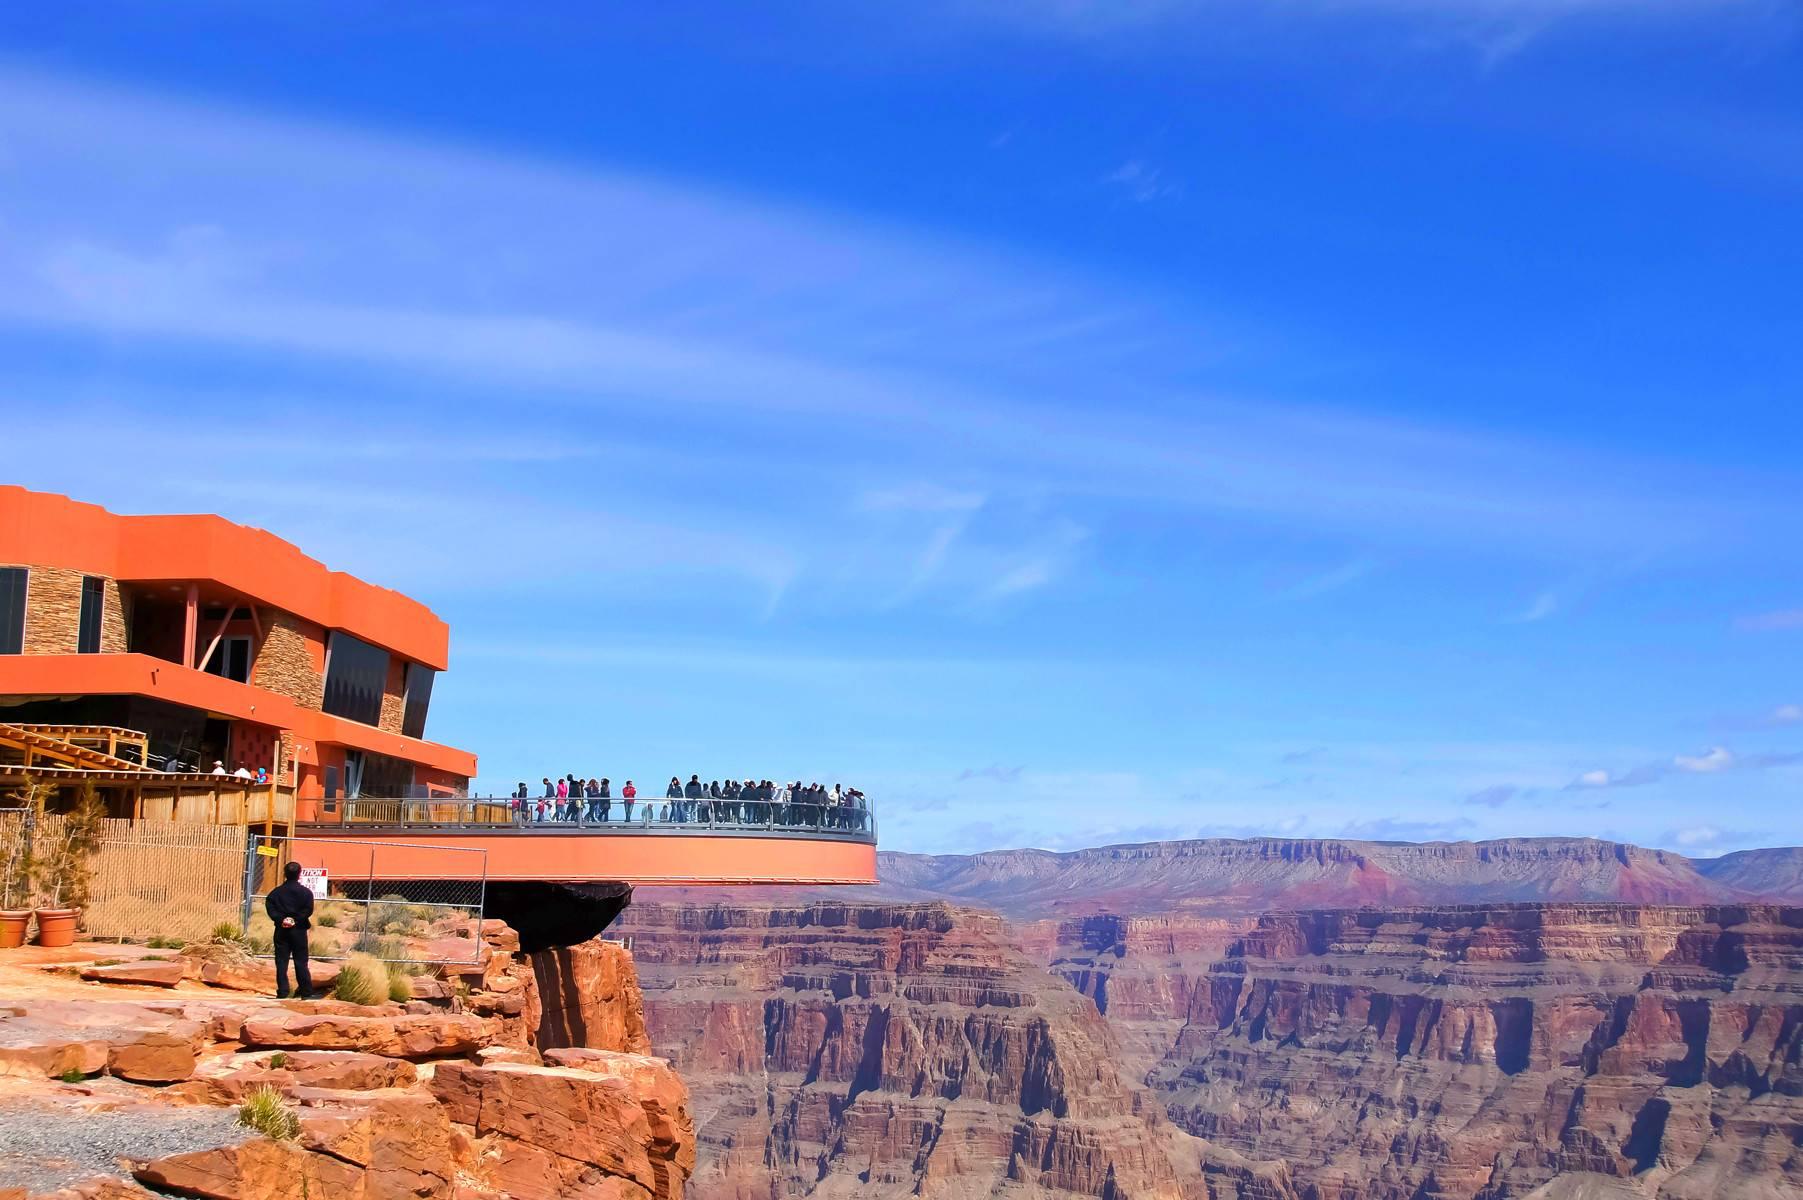 4-Day Grand Canyon West (Skywalk) Bus Tour: Las Vegas/Antelope Canyon